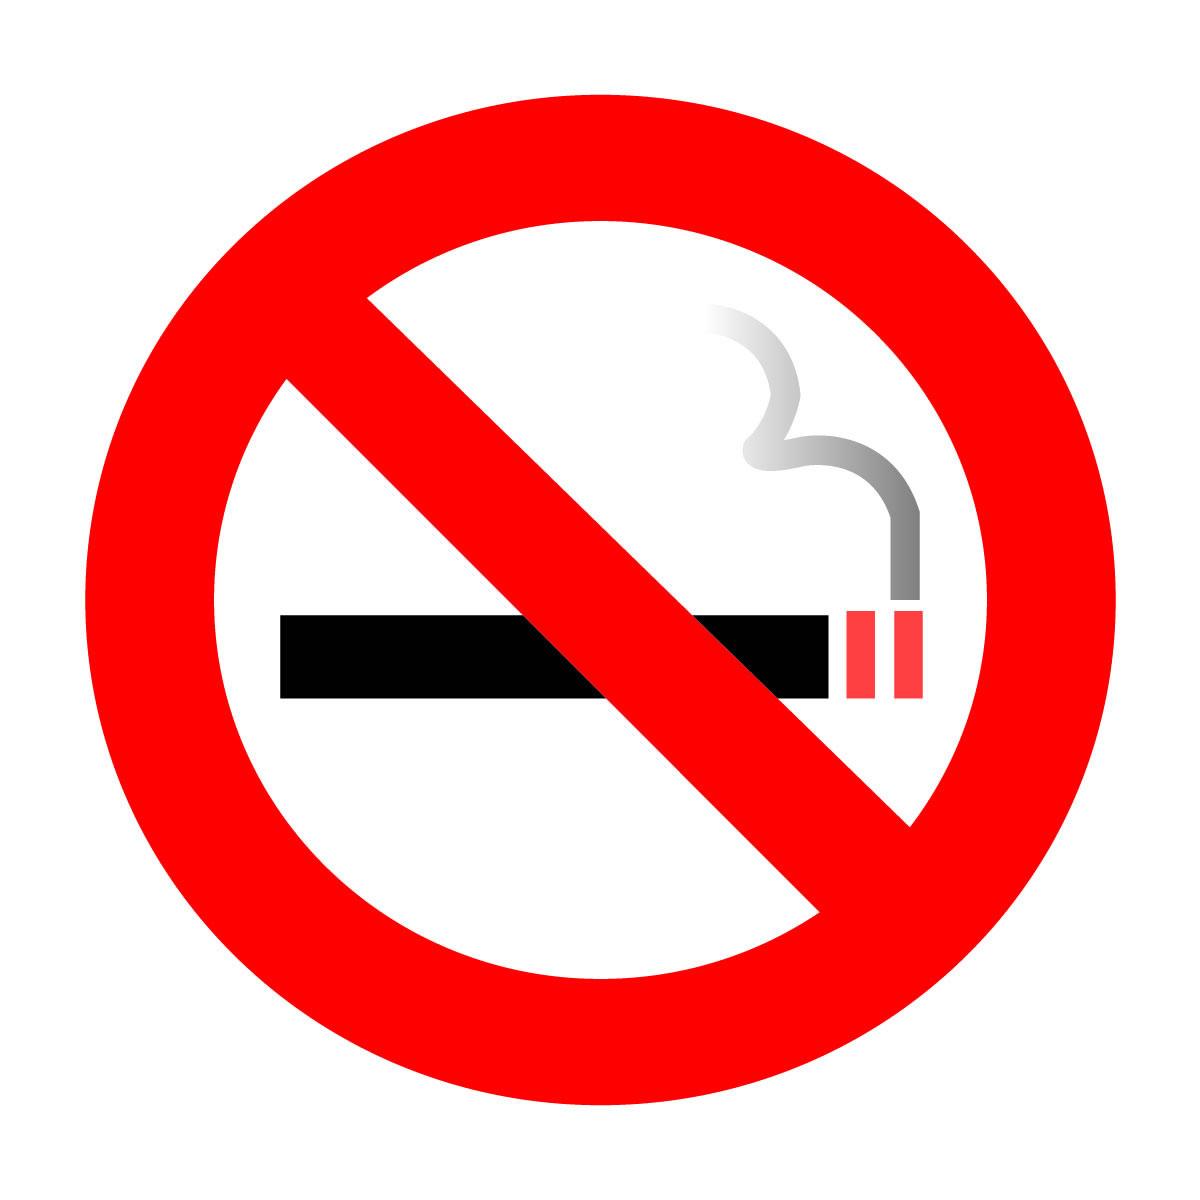 Caremark_Extra_Co-Pay_no_smoking